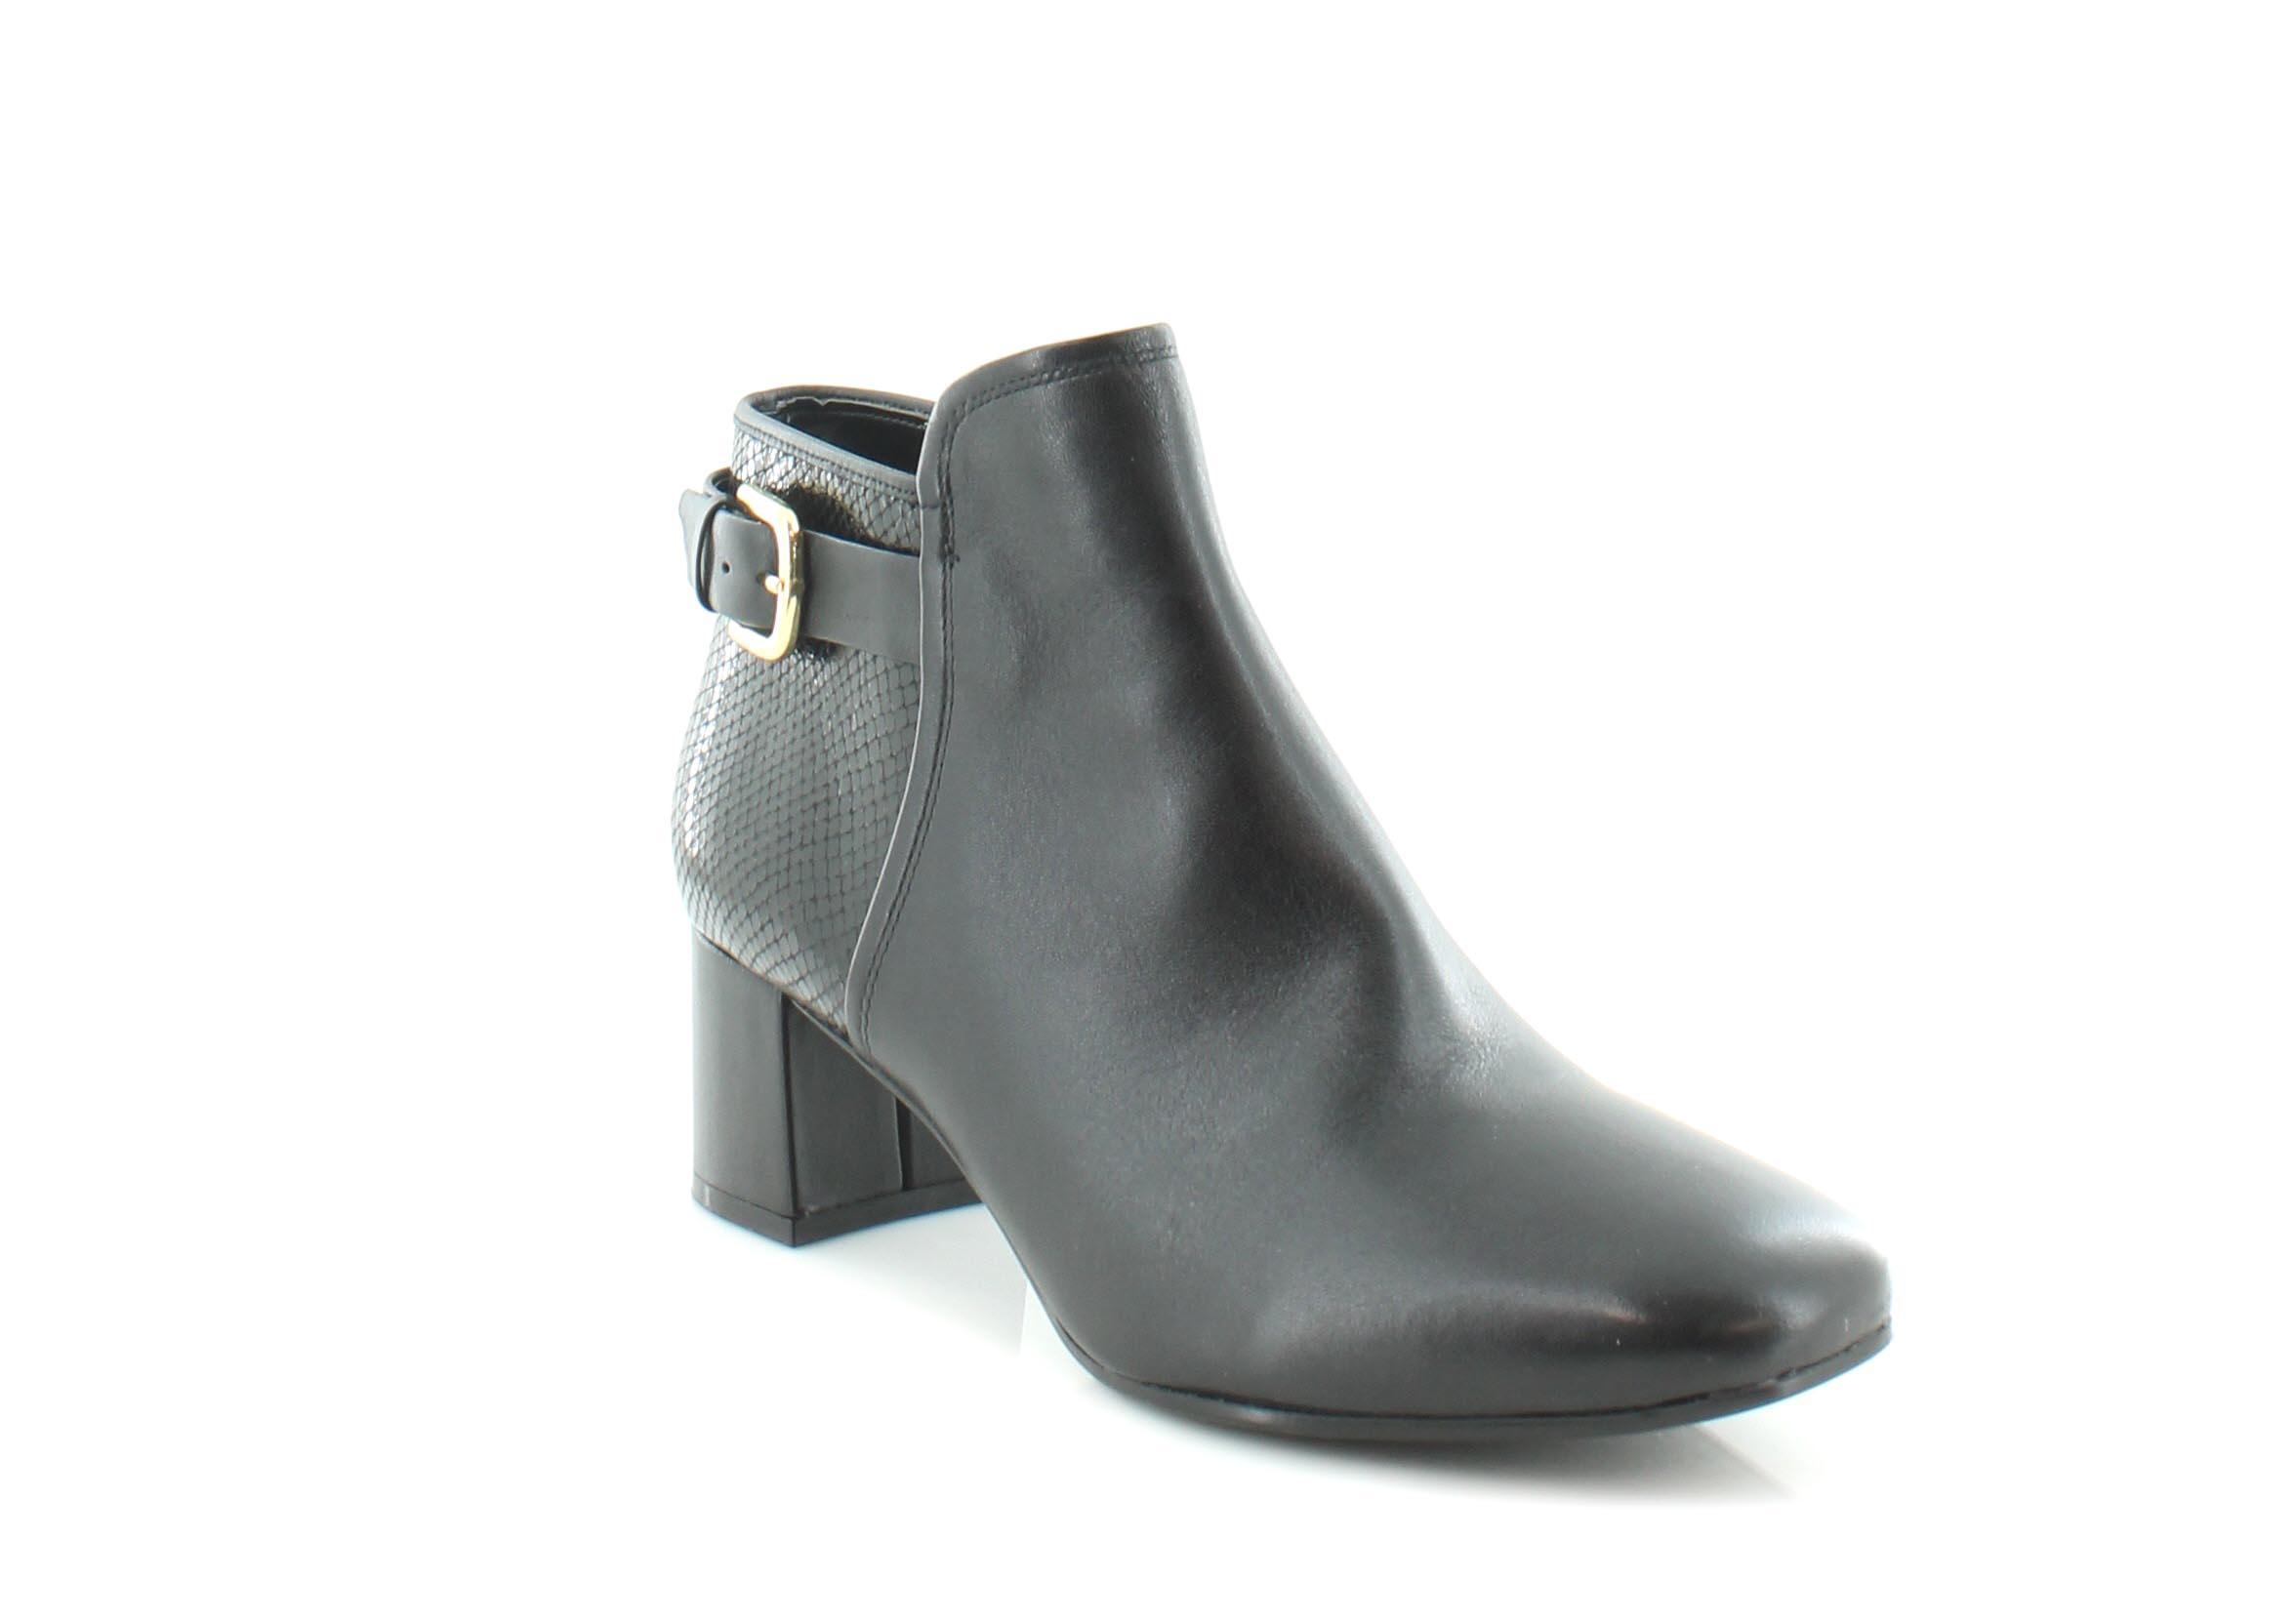 Naturalizer Nailah Women's Boots by Naturalizer